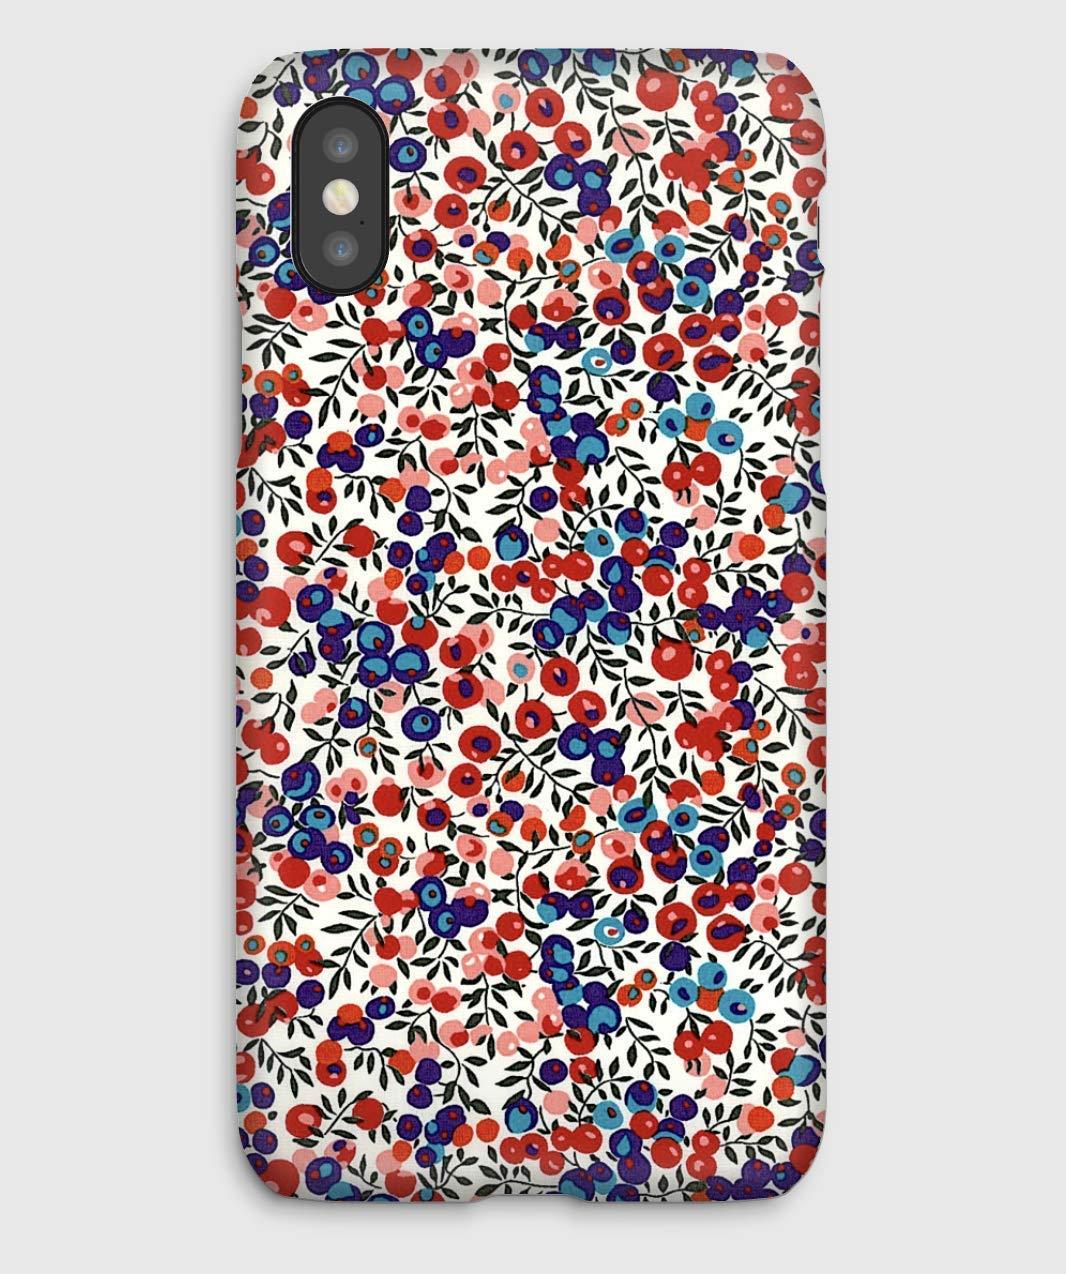 Wiltshire A, coque pour iPhone XS, XS Max, XR, X, 8, 8+, 7, 7+, 6S, 6, 6S+, 6+, 5C, 5, 5S, 5SE, 4S, 4,